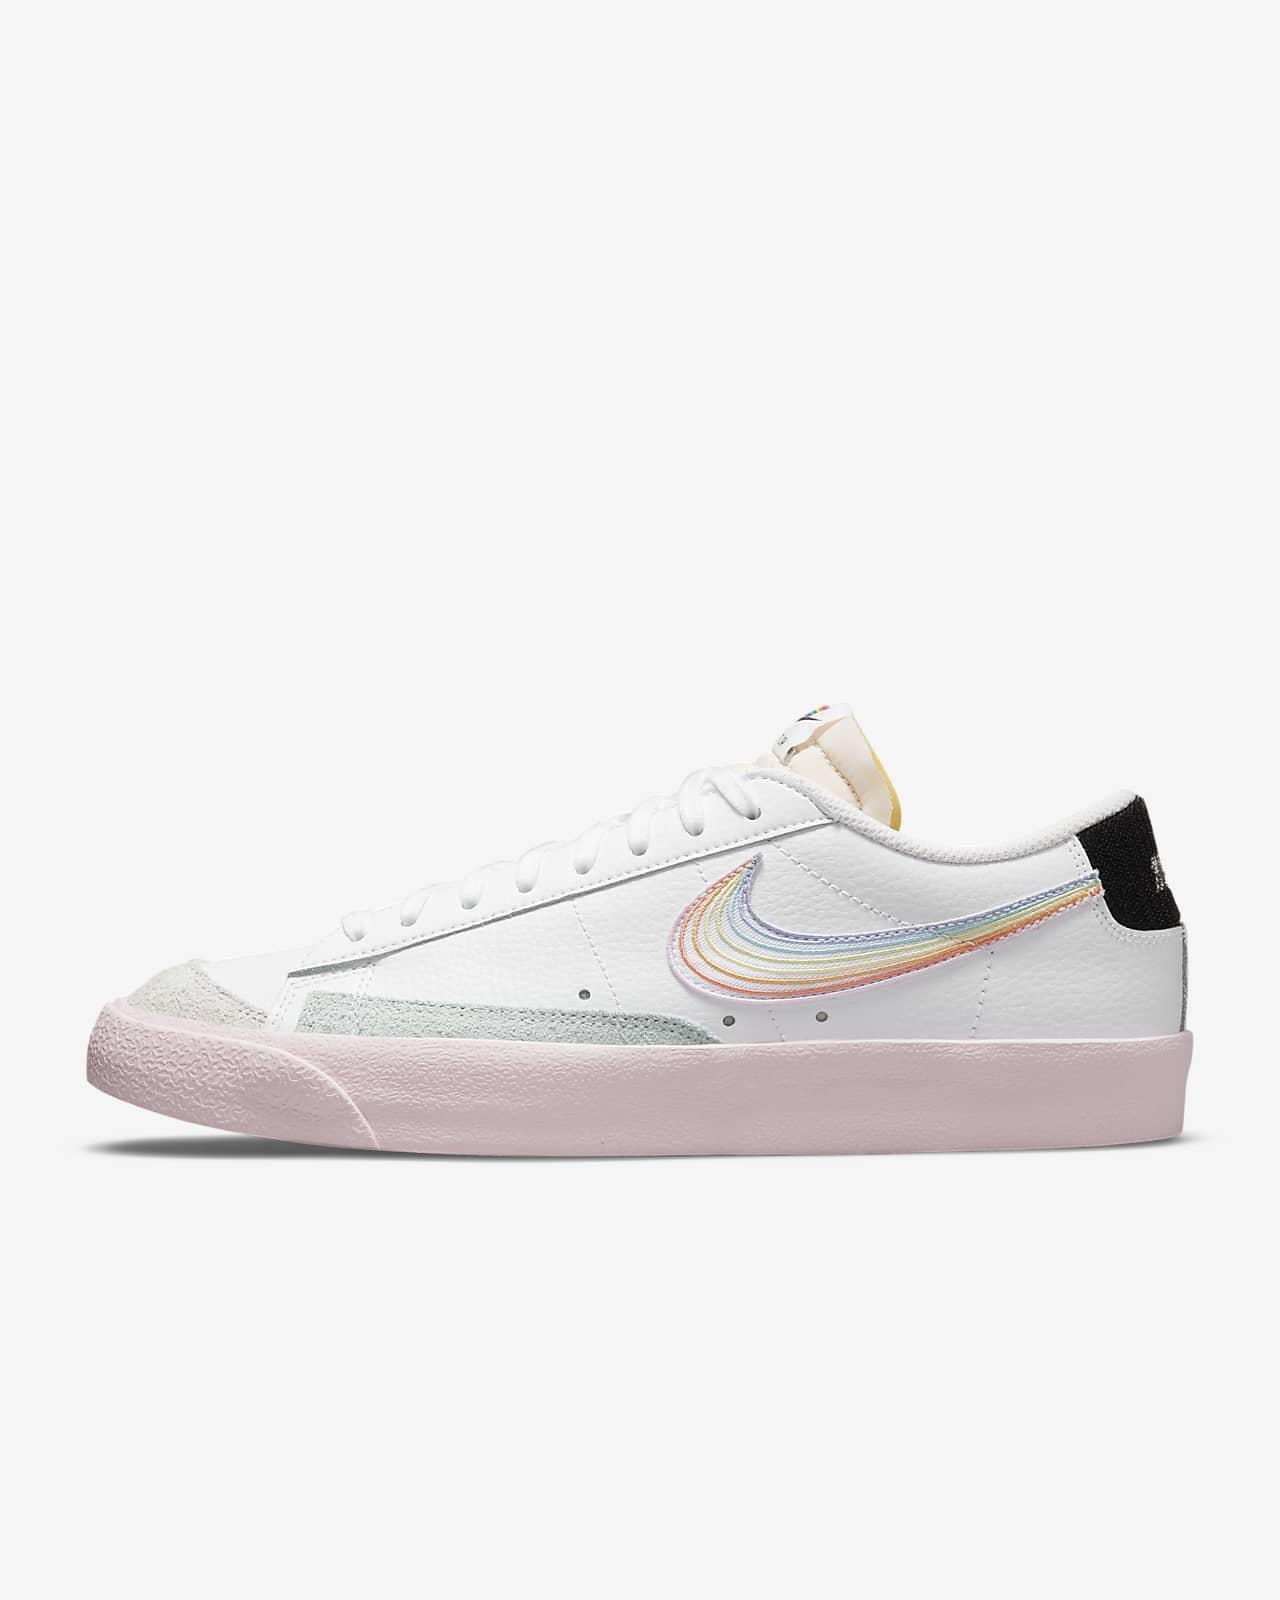 Nike Blazer Low '77 Vintage Be True Shoes